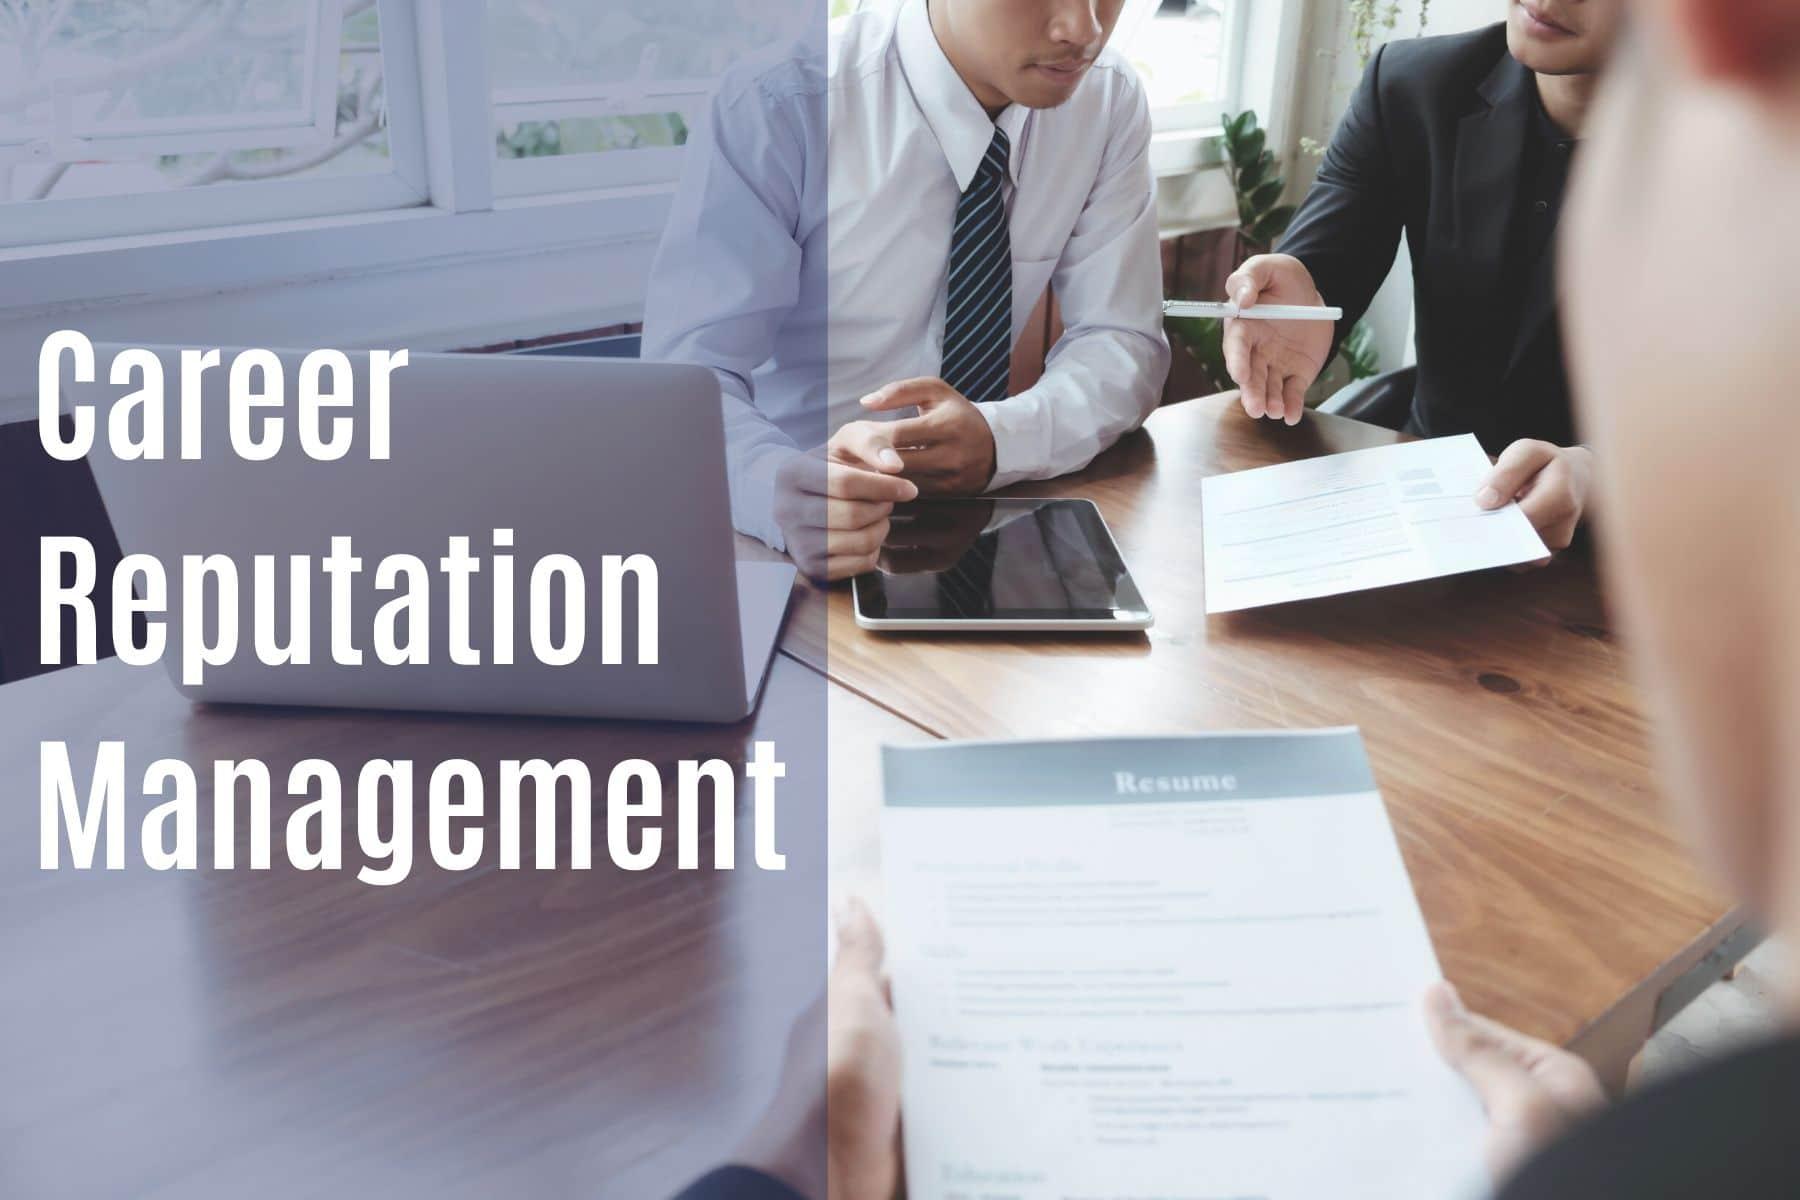 Career Reputation Management